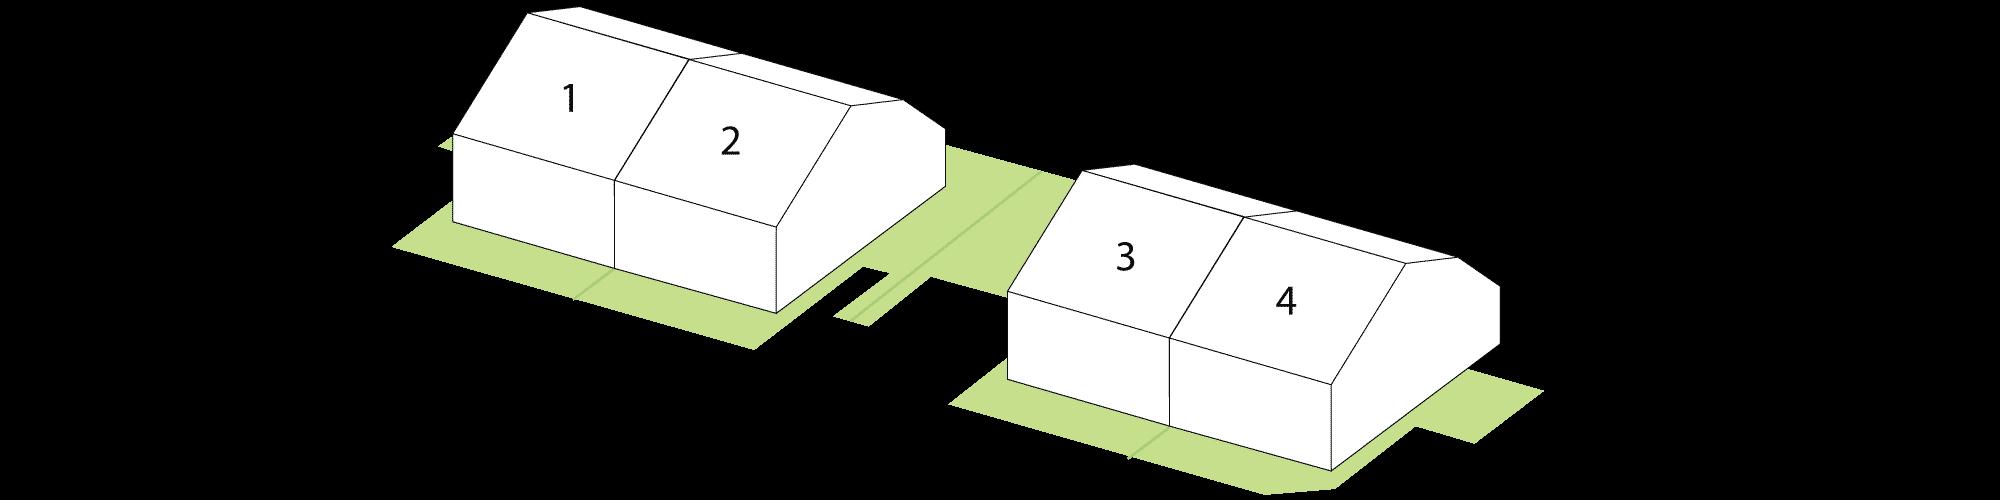 Angebot image